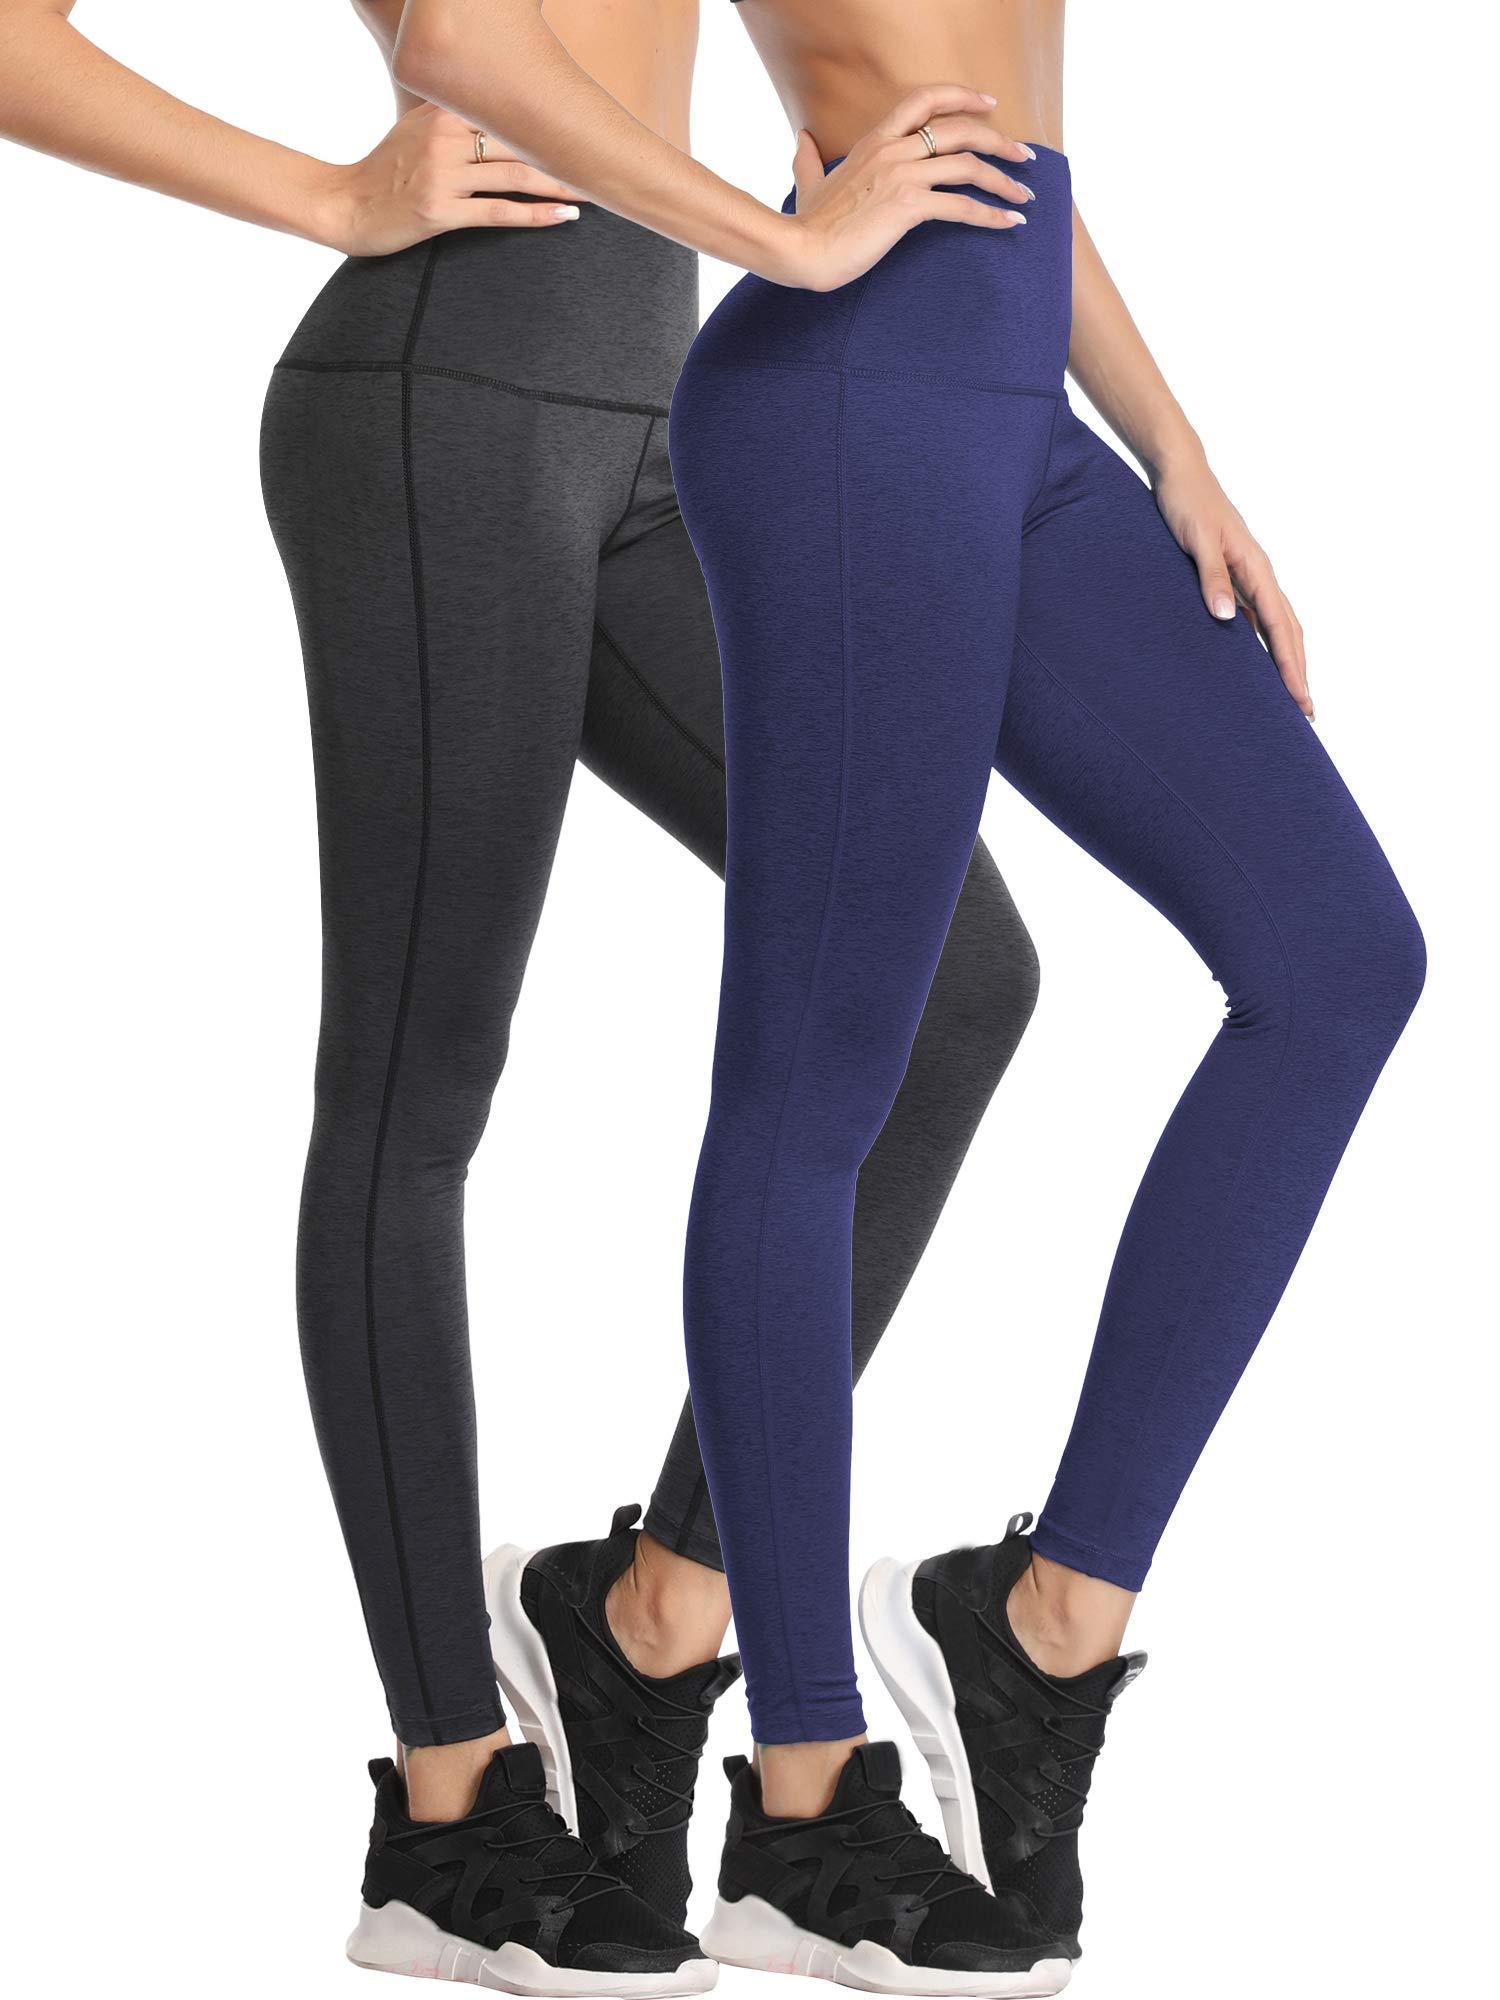 Cadmus Tummy Control Workout Leggings for Yoga Womens,1101,Dark Grey & Navy Blue,Small